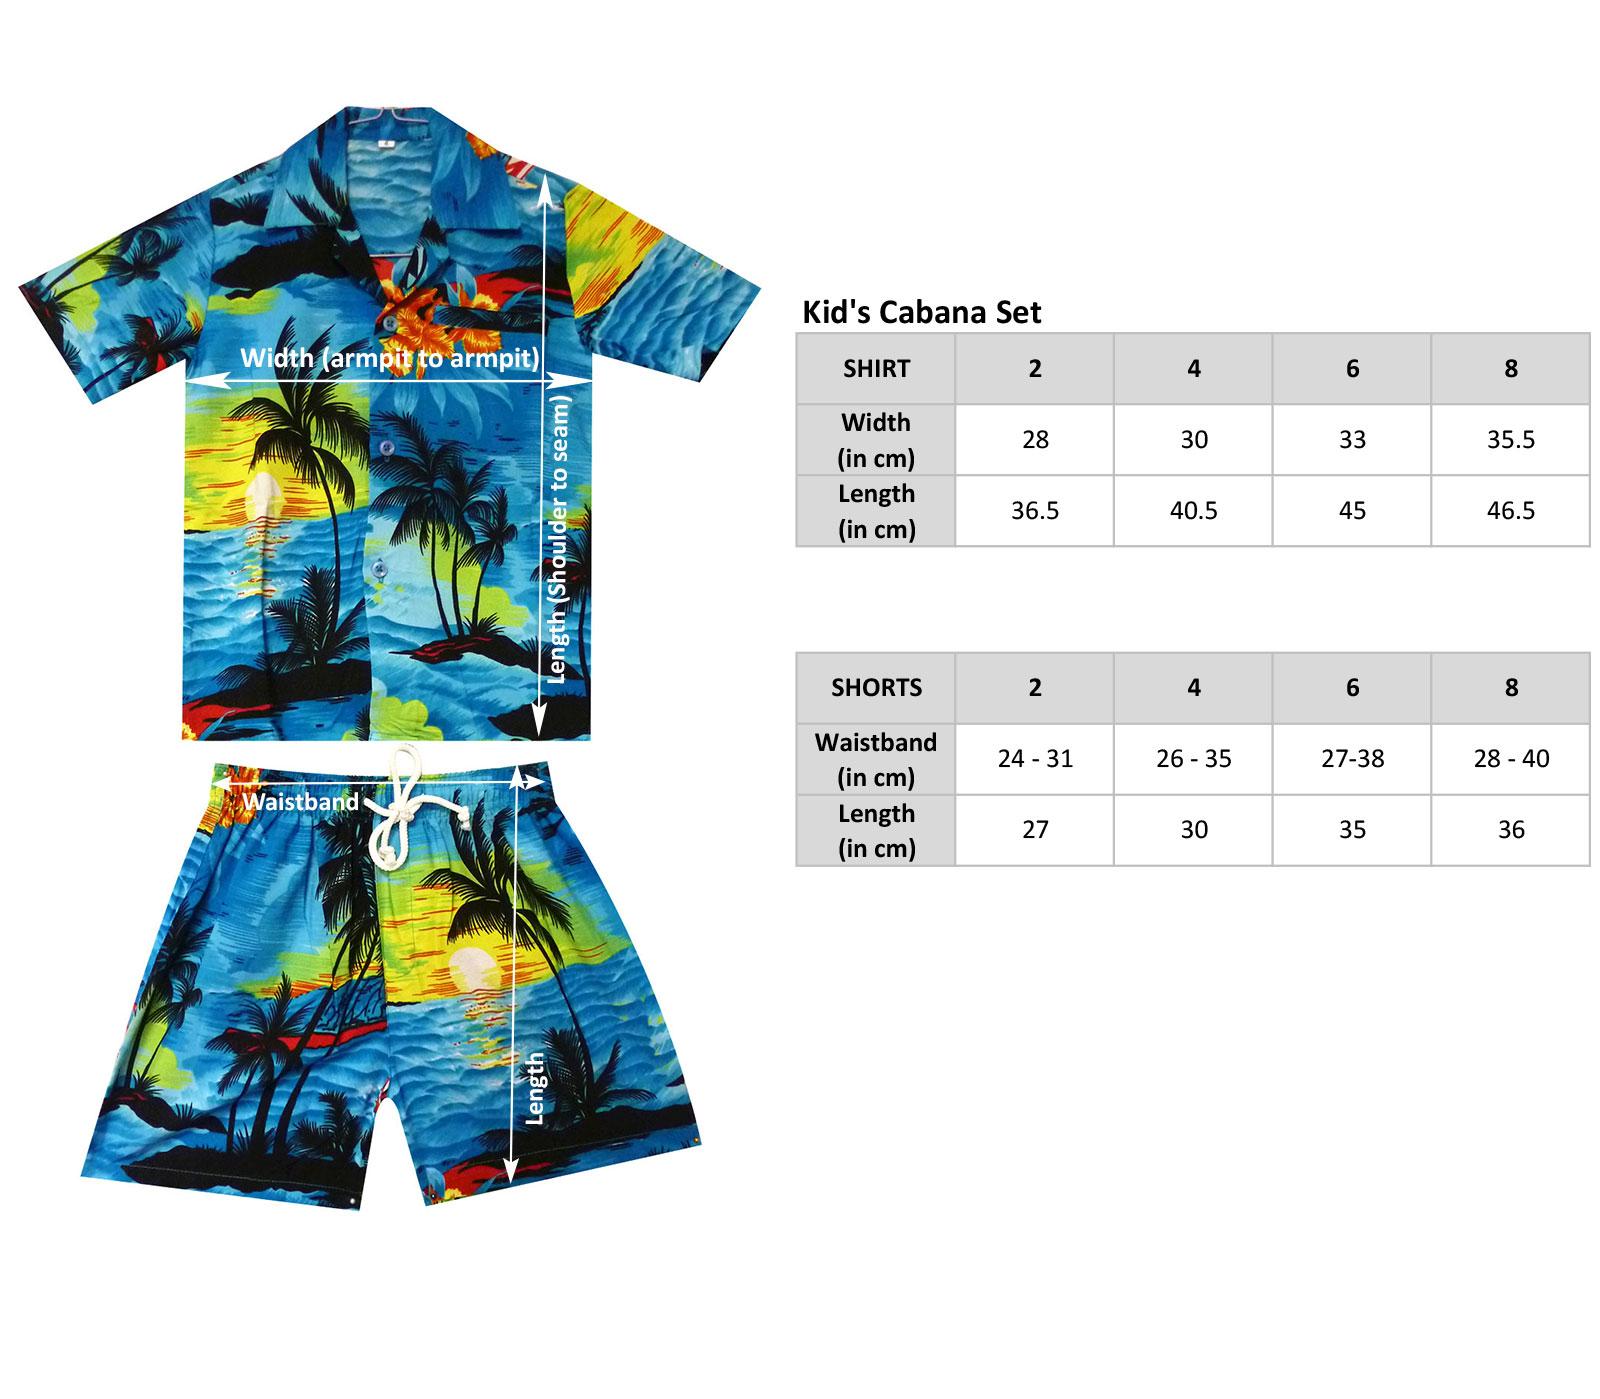 VHO_Cabana_Sets_Size_Charts_EN_cm